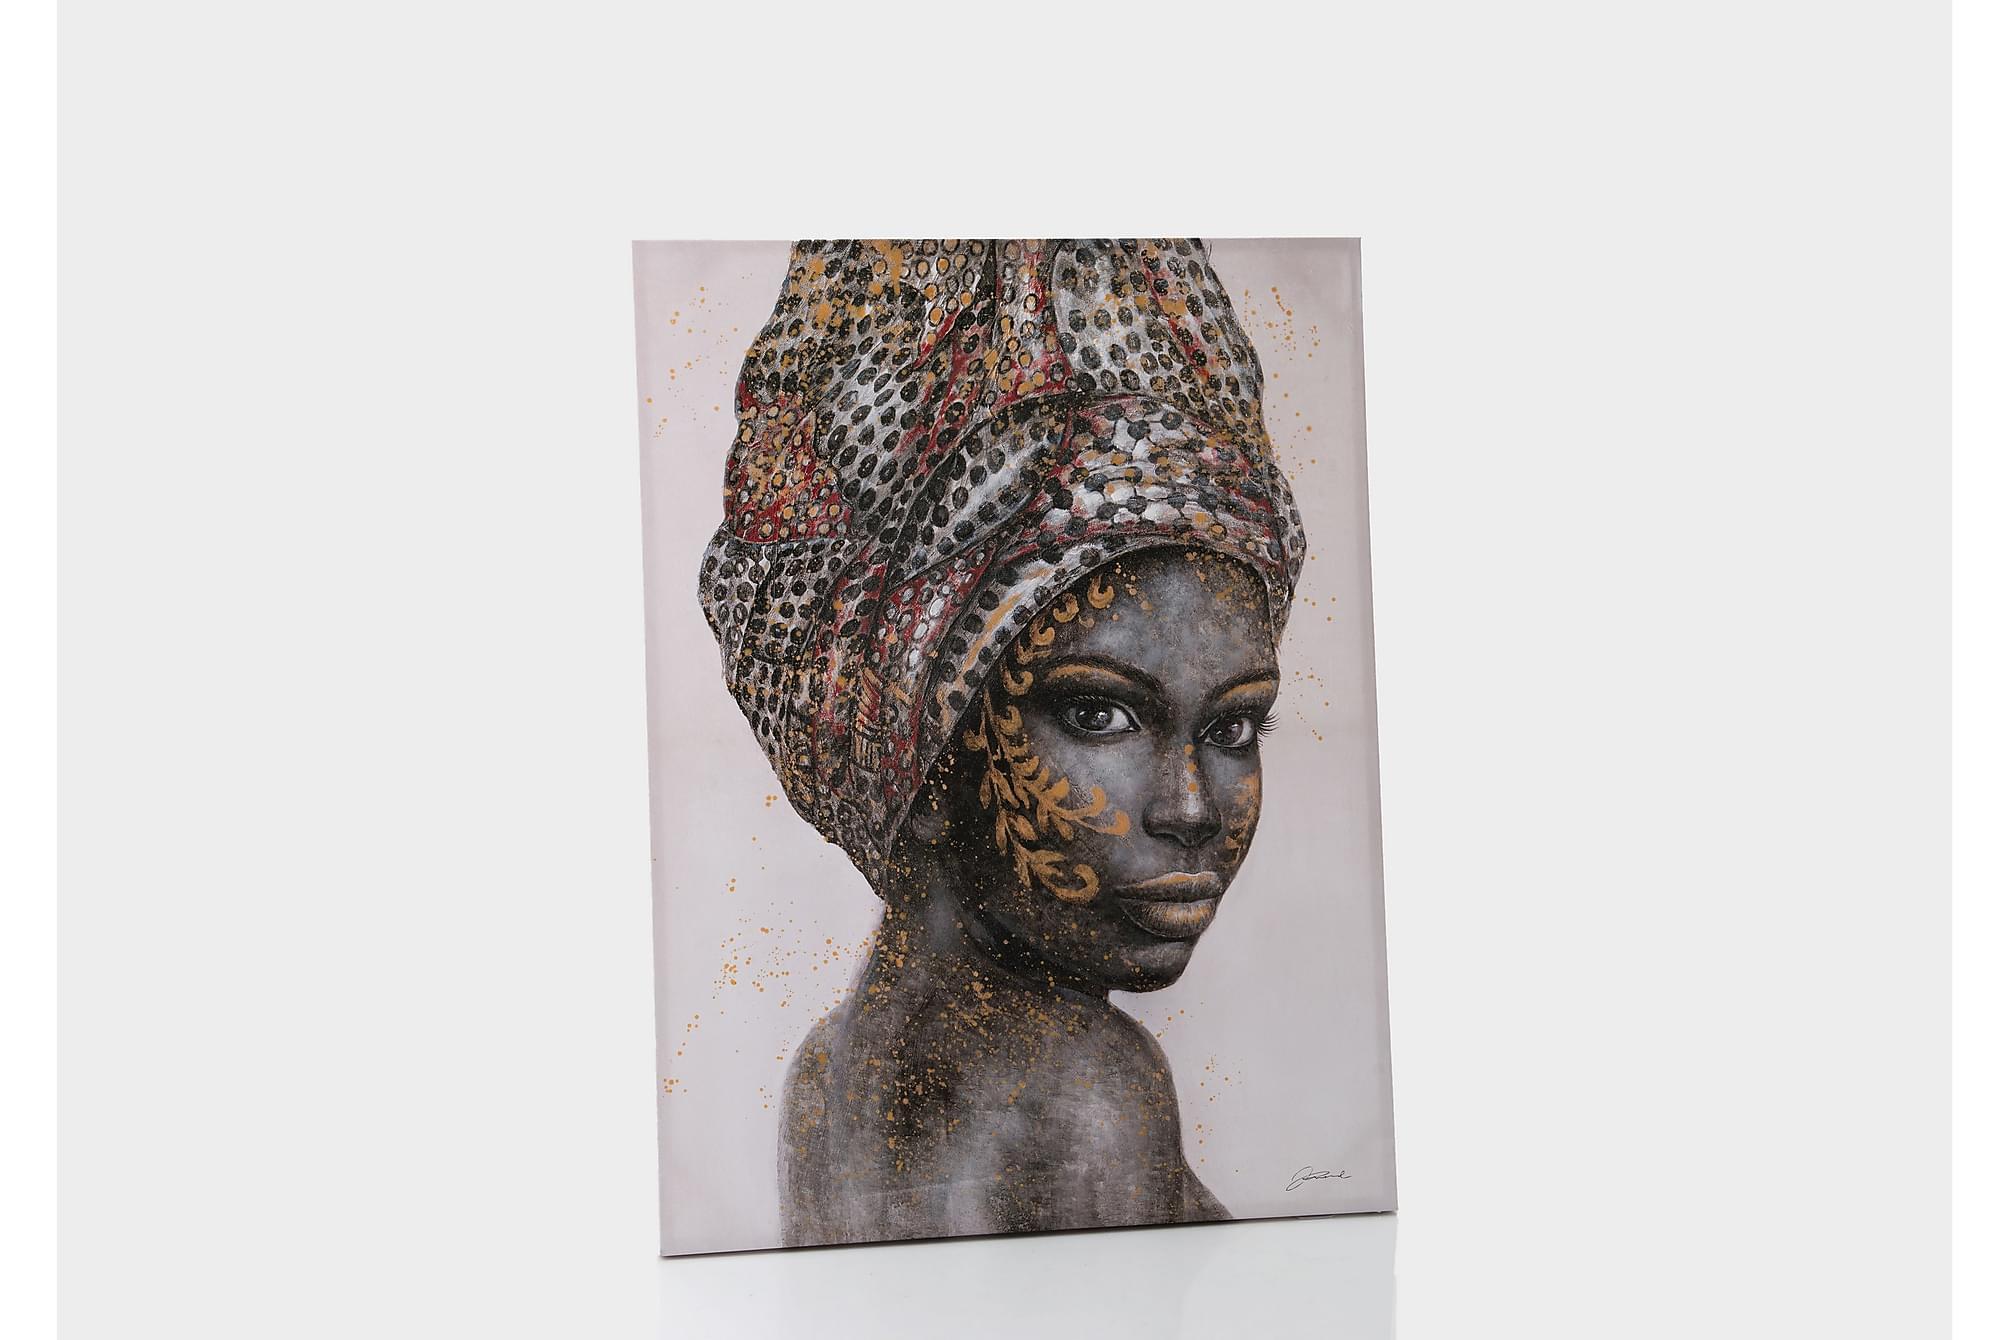 AVICHAI Canvastavla 90x120 cm, Posters & tavlor